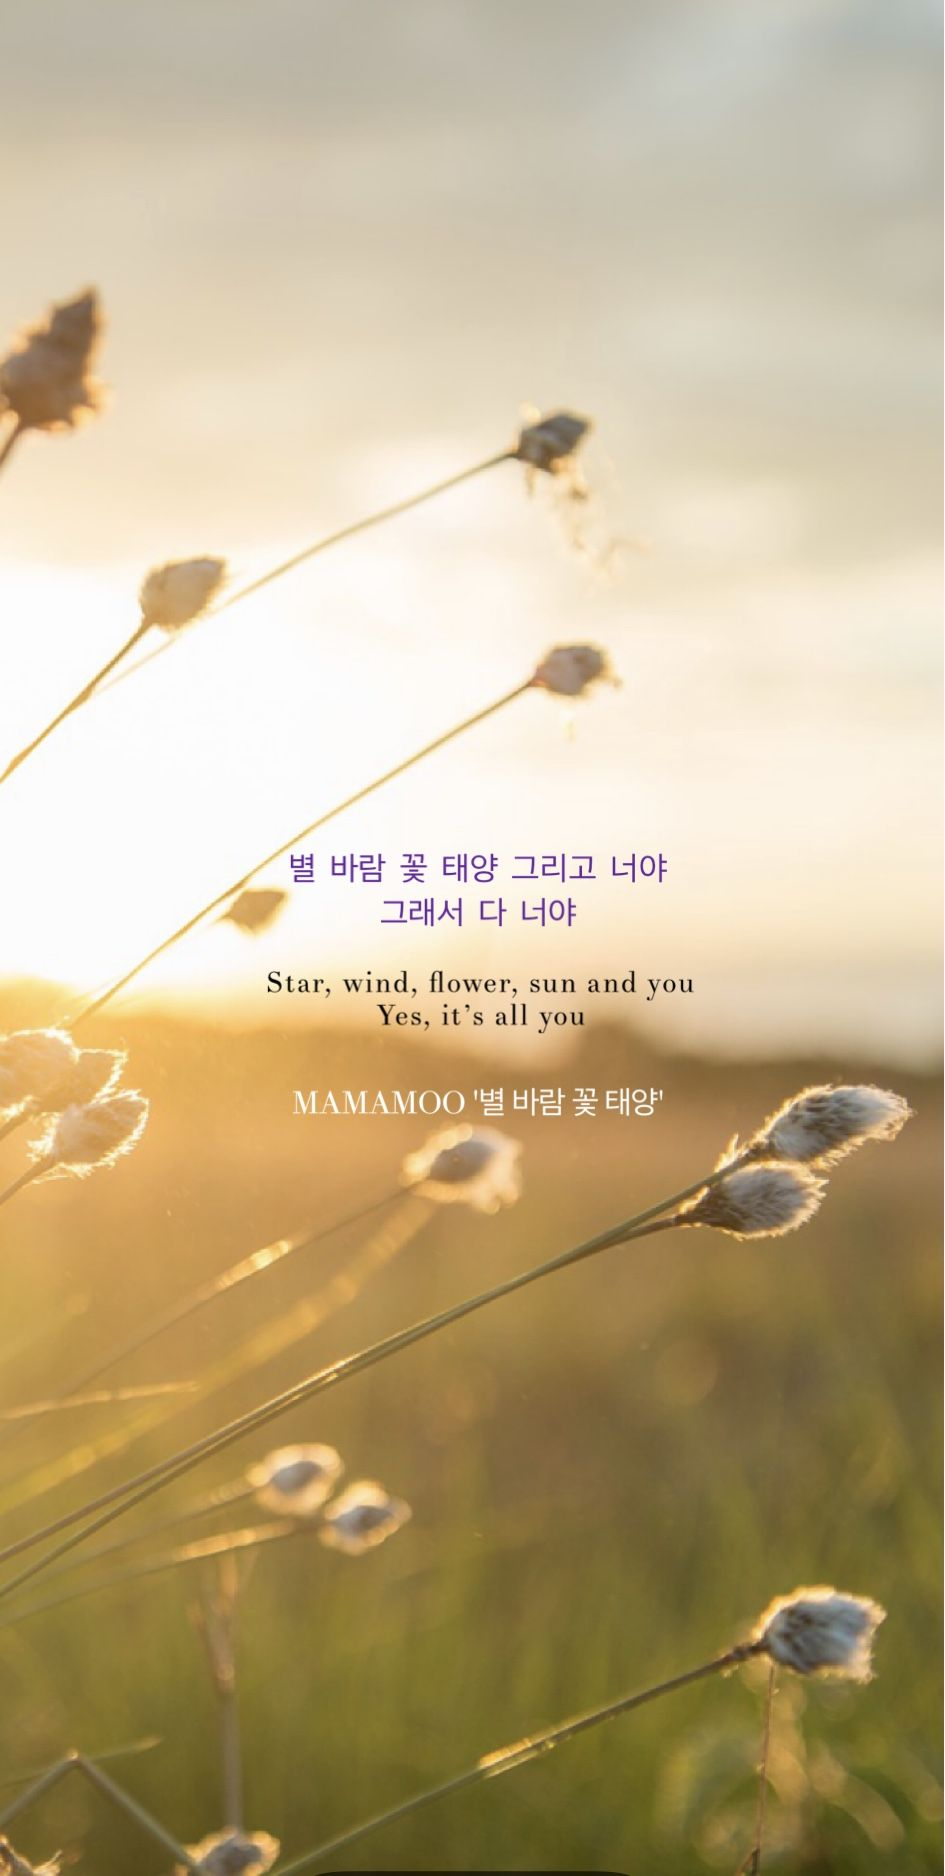 Jean21 On Twitter Mamamoo Flower Lyrics Song Lyrics Wallpaper